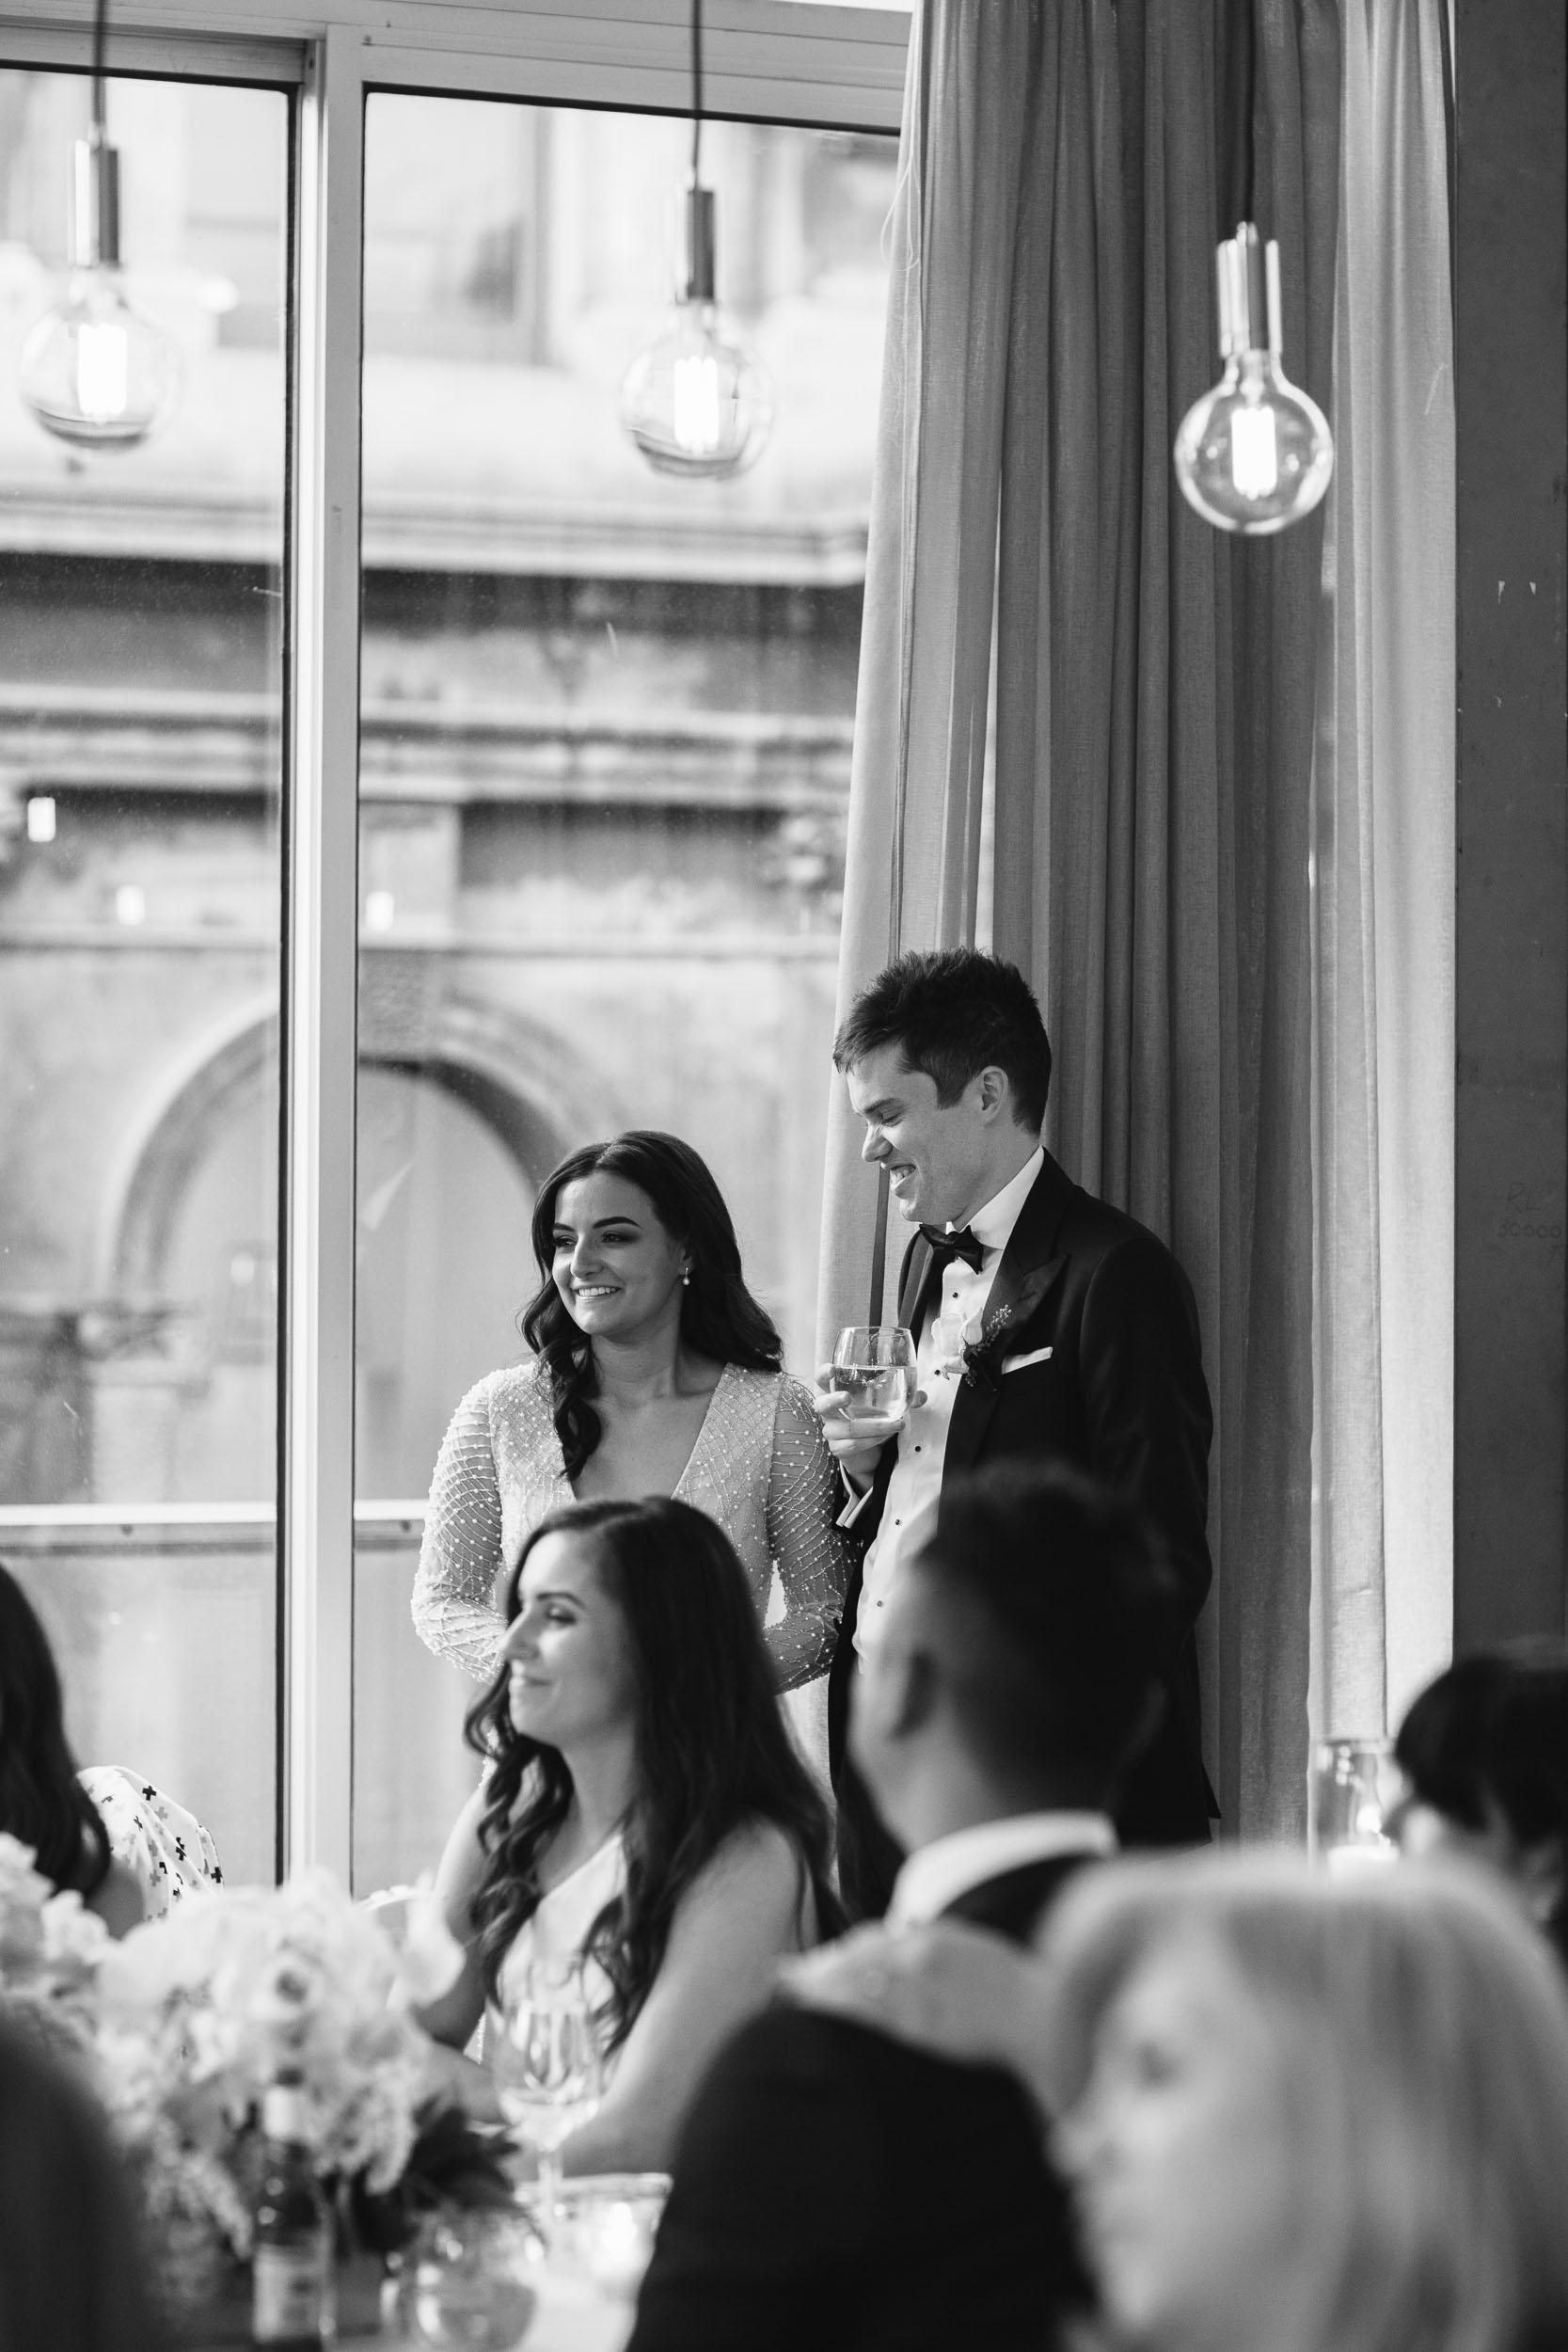 Kas-Richards-Wedding-Photographer-Melbourne-City-Wedding-Alto-Event-Space-Jane-Hill-Bridal-Gown-64.jpg